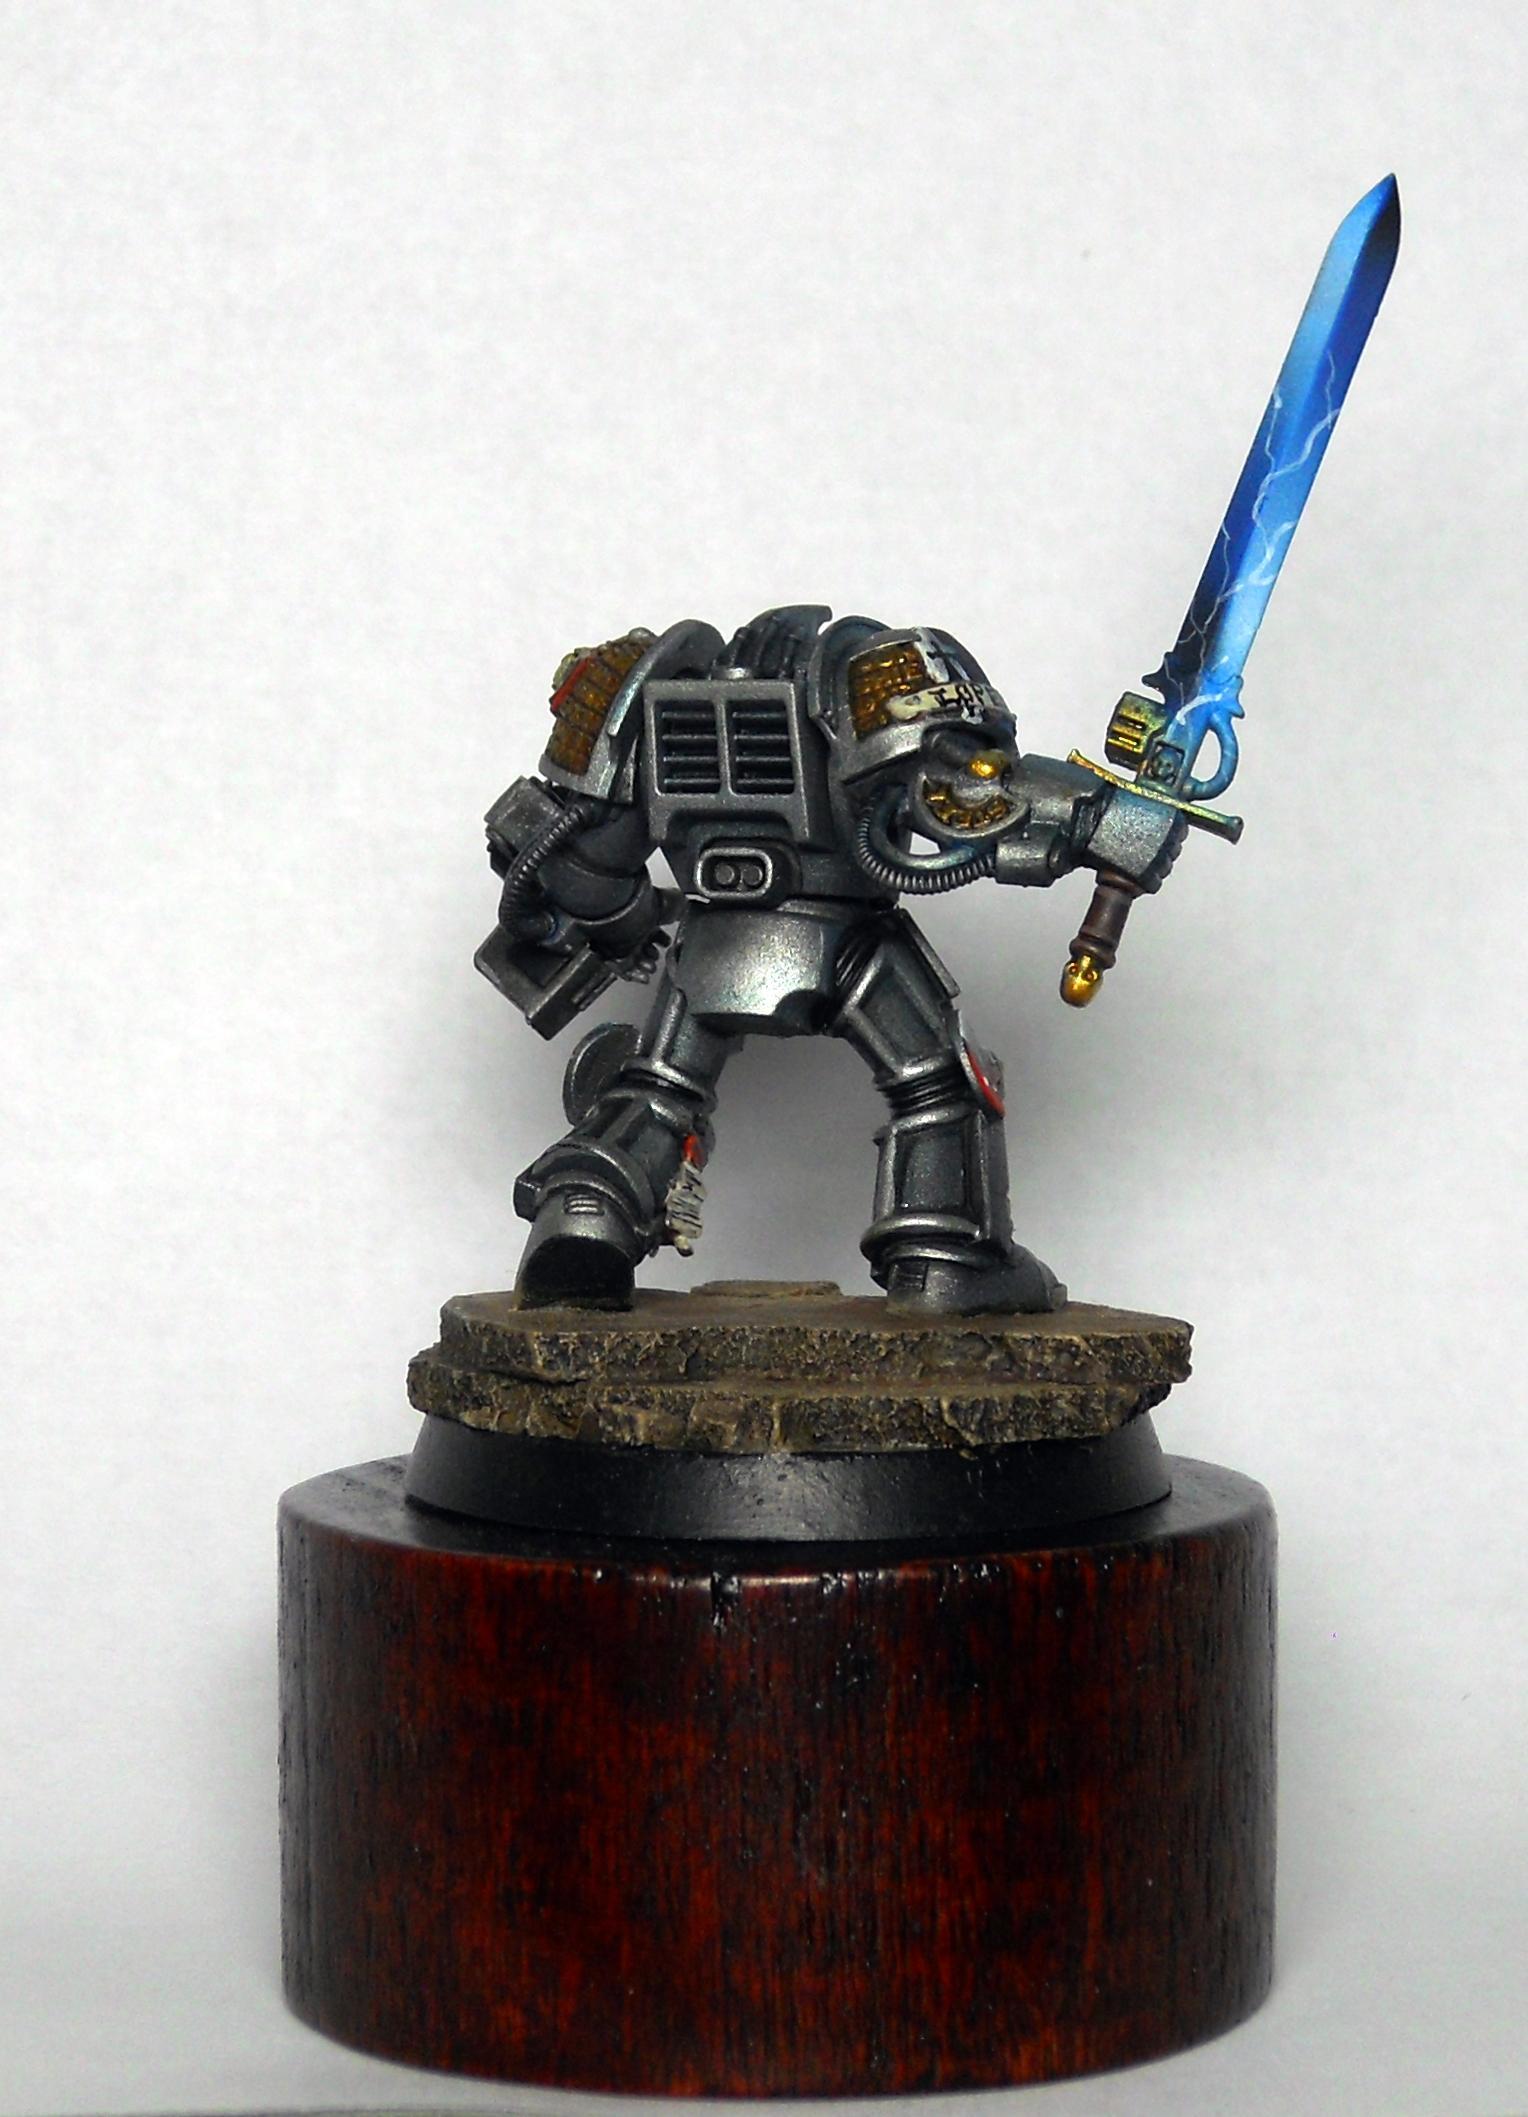 Grey Knights, Power Sword, Space Marines, Terminator Armor, Warhammer 40,000